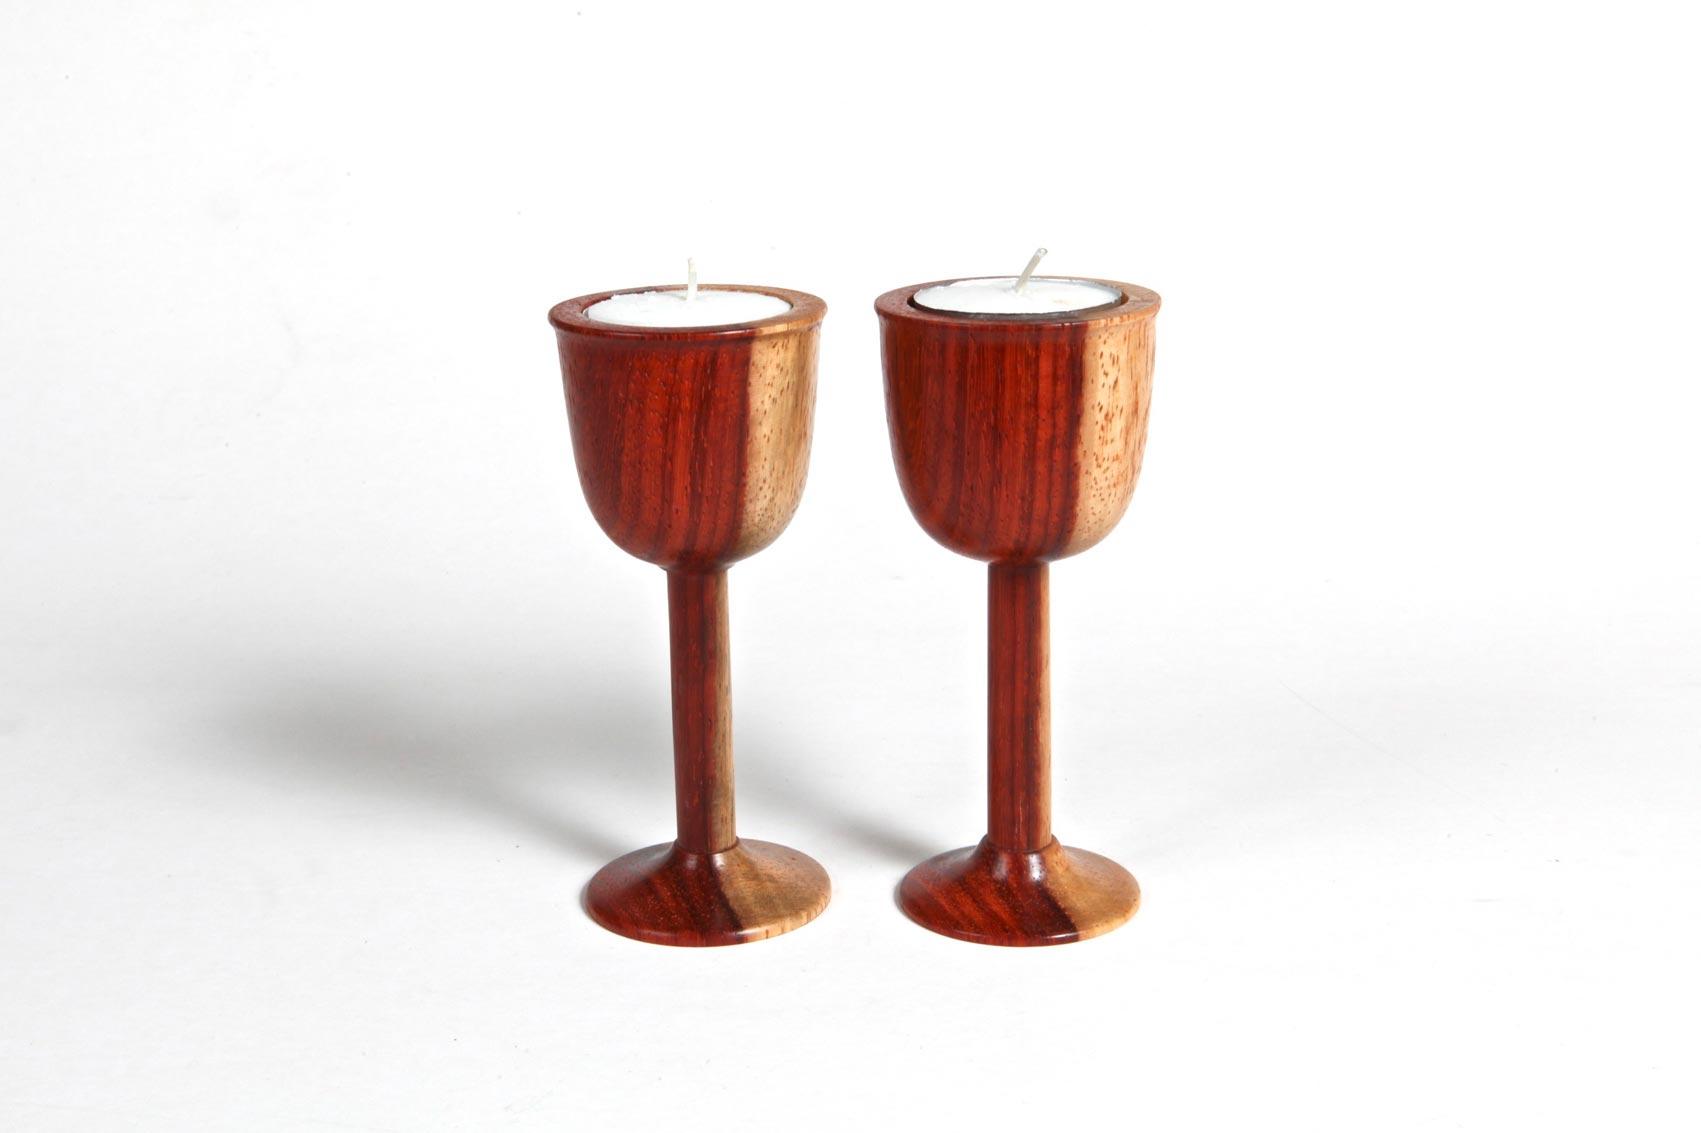 padauk-tee-light-goblet-pair